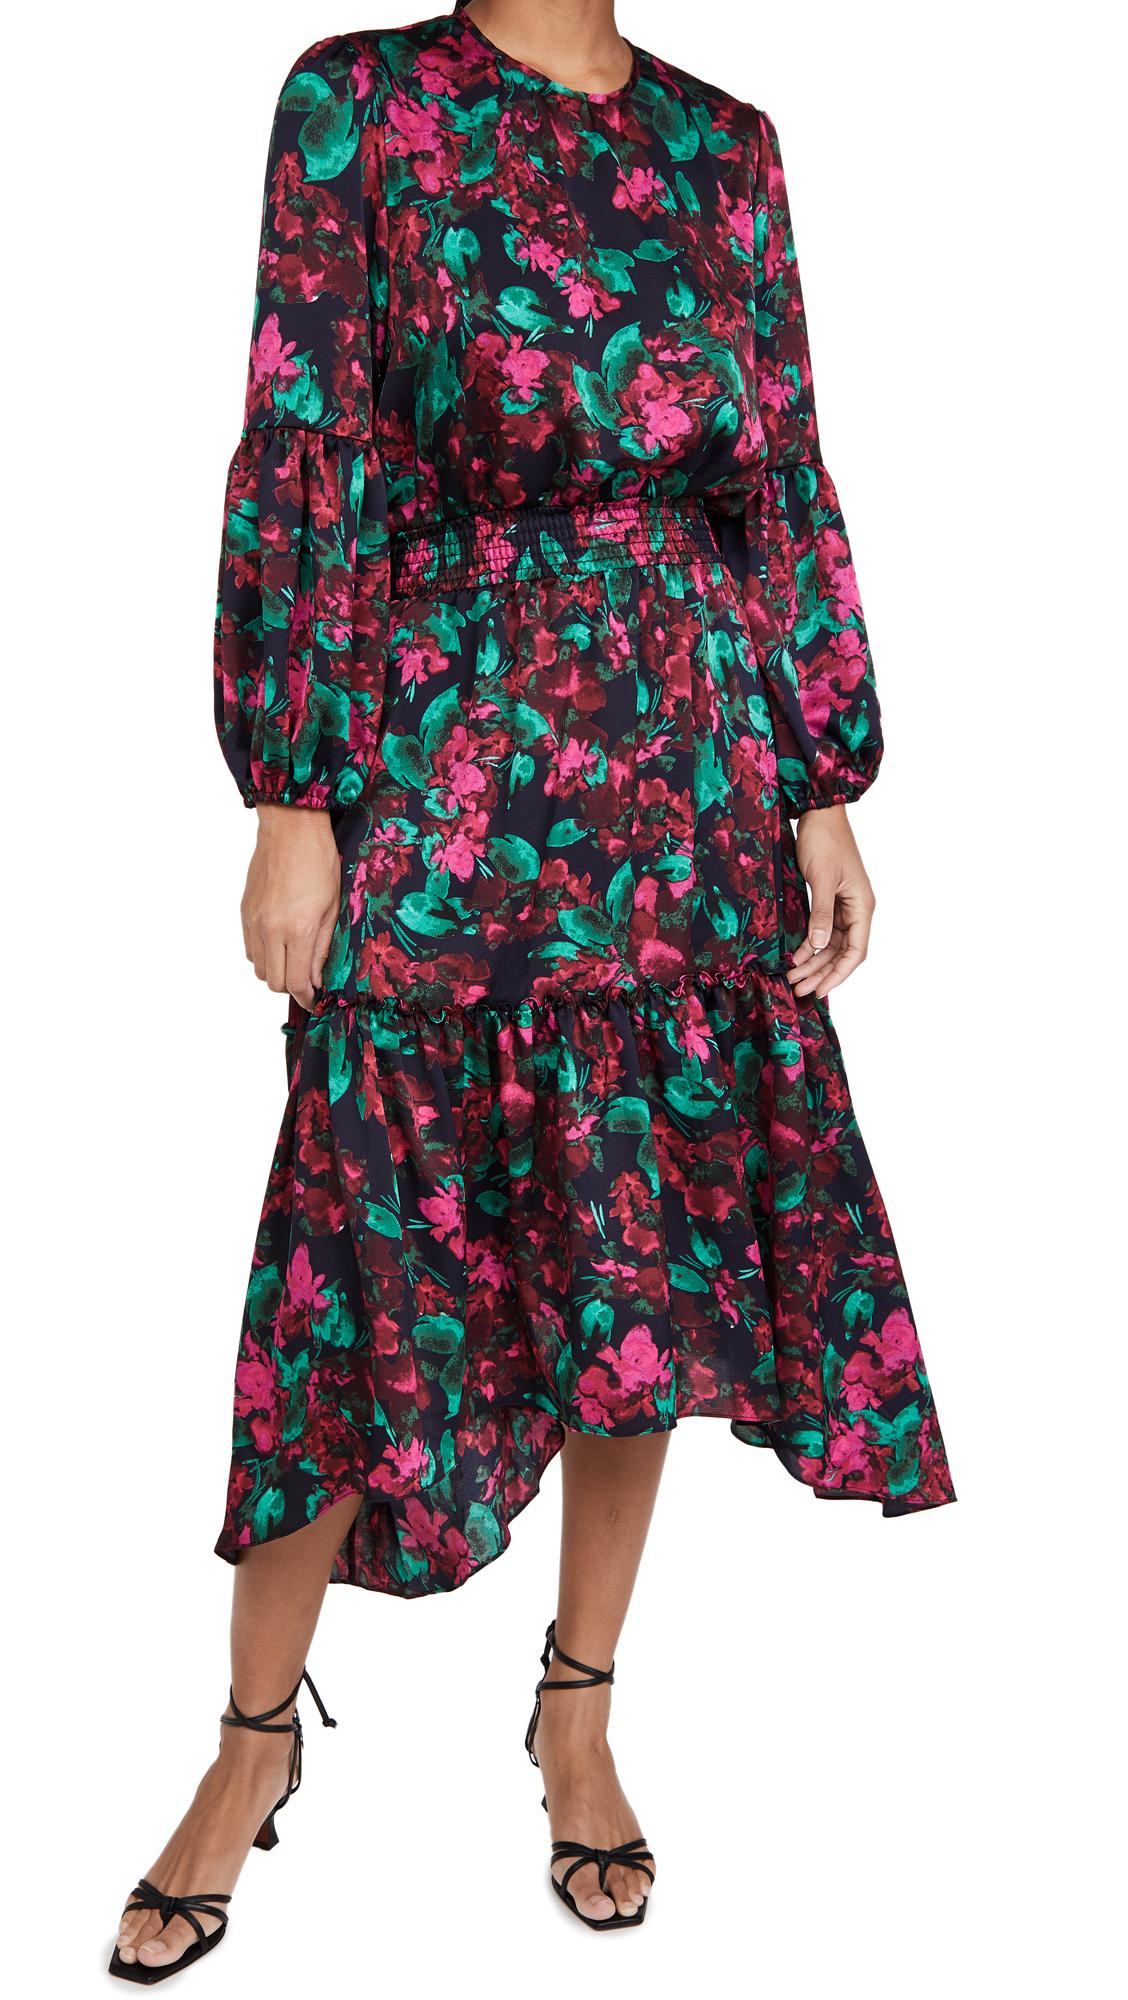 MISA Simone Dress